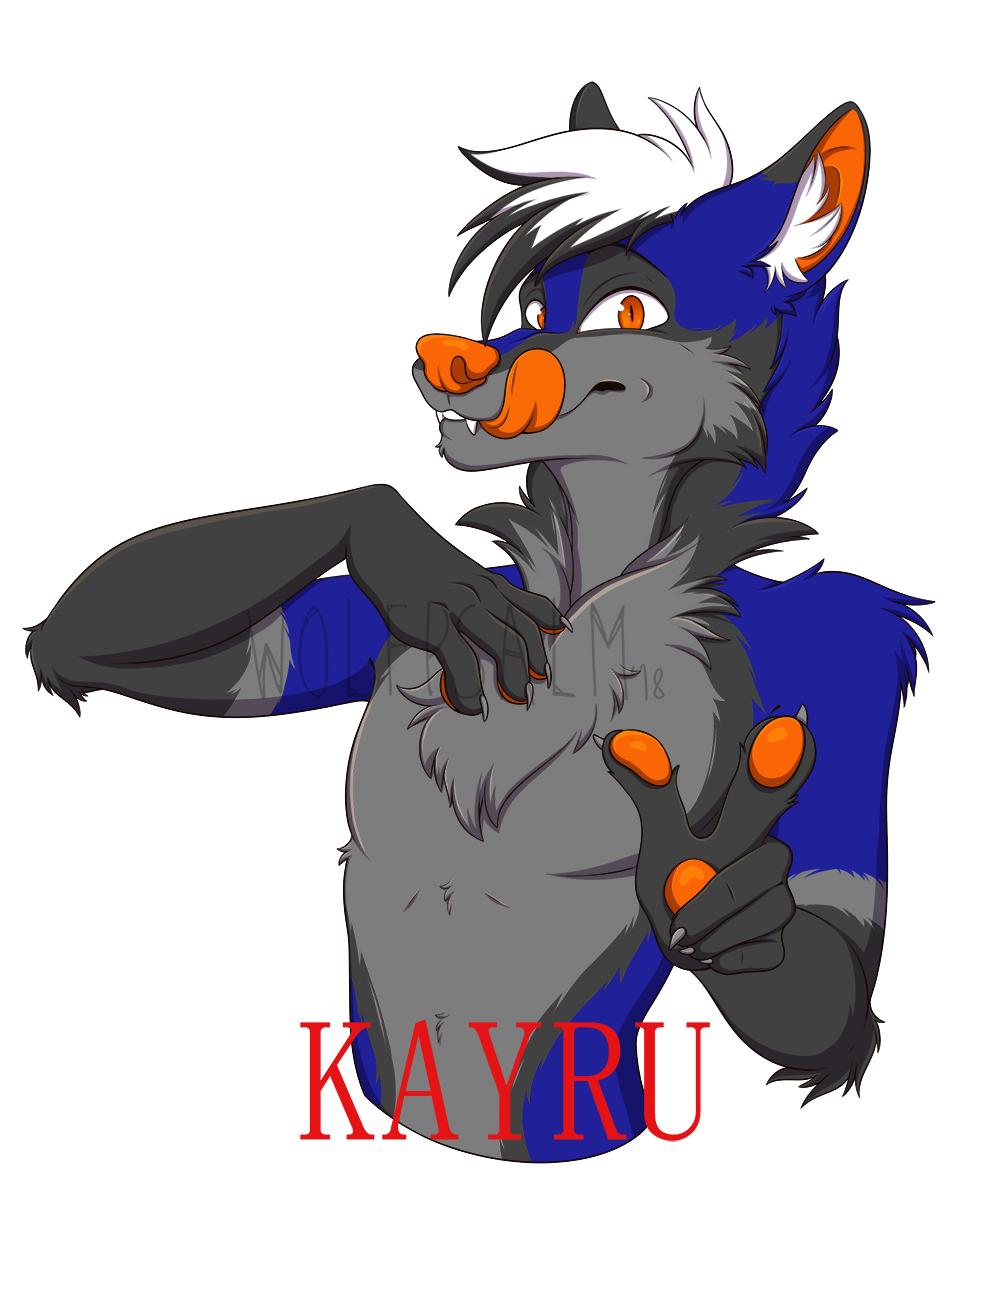 Most recent image:  Kayru FE2018 Badge